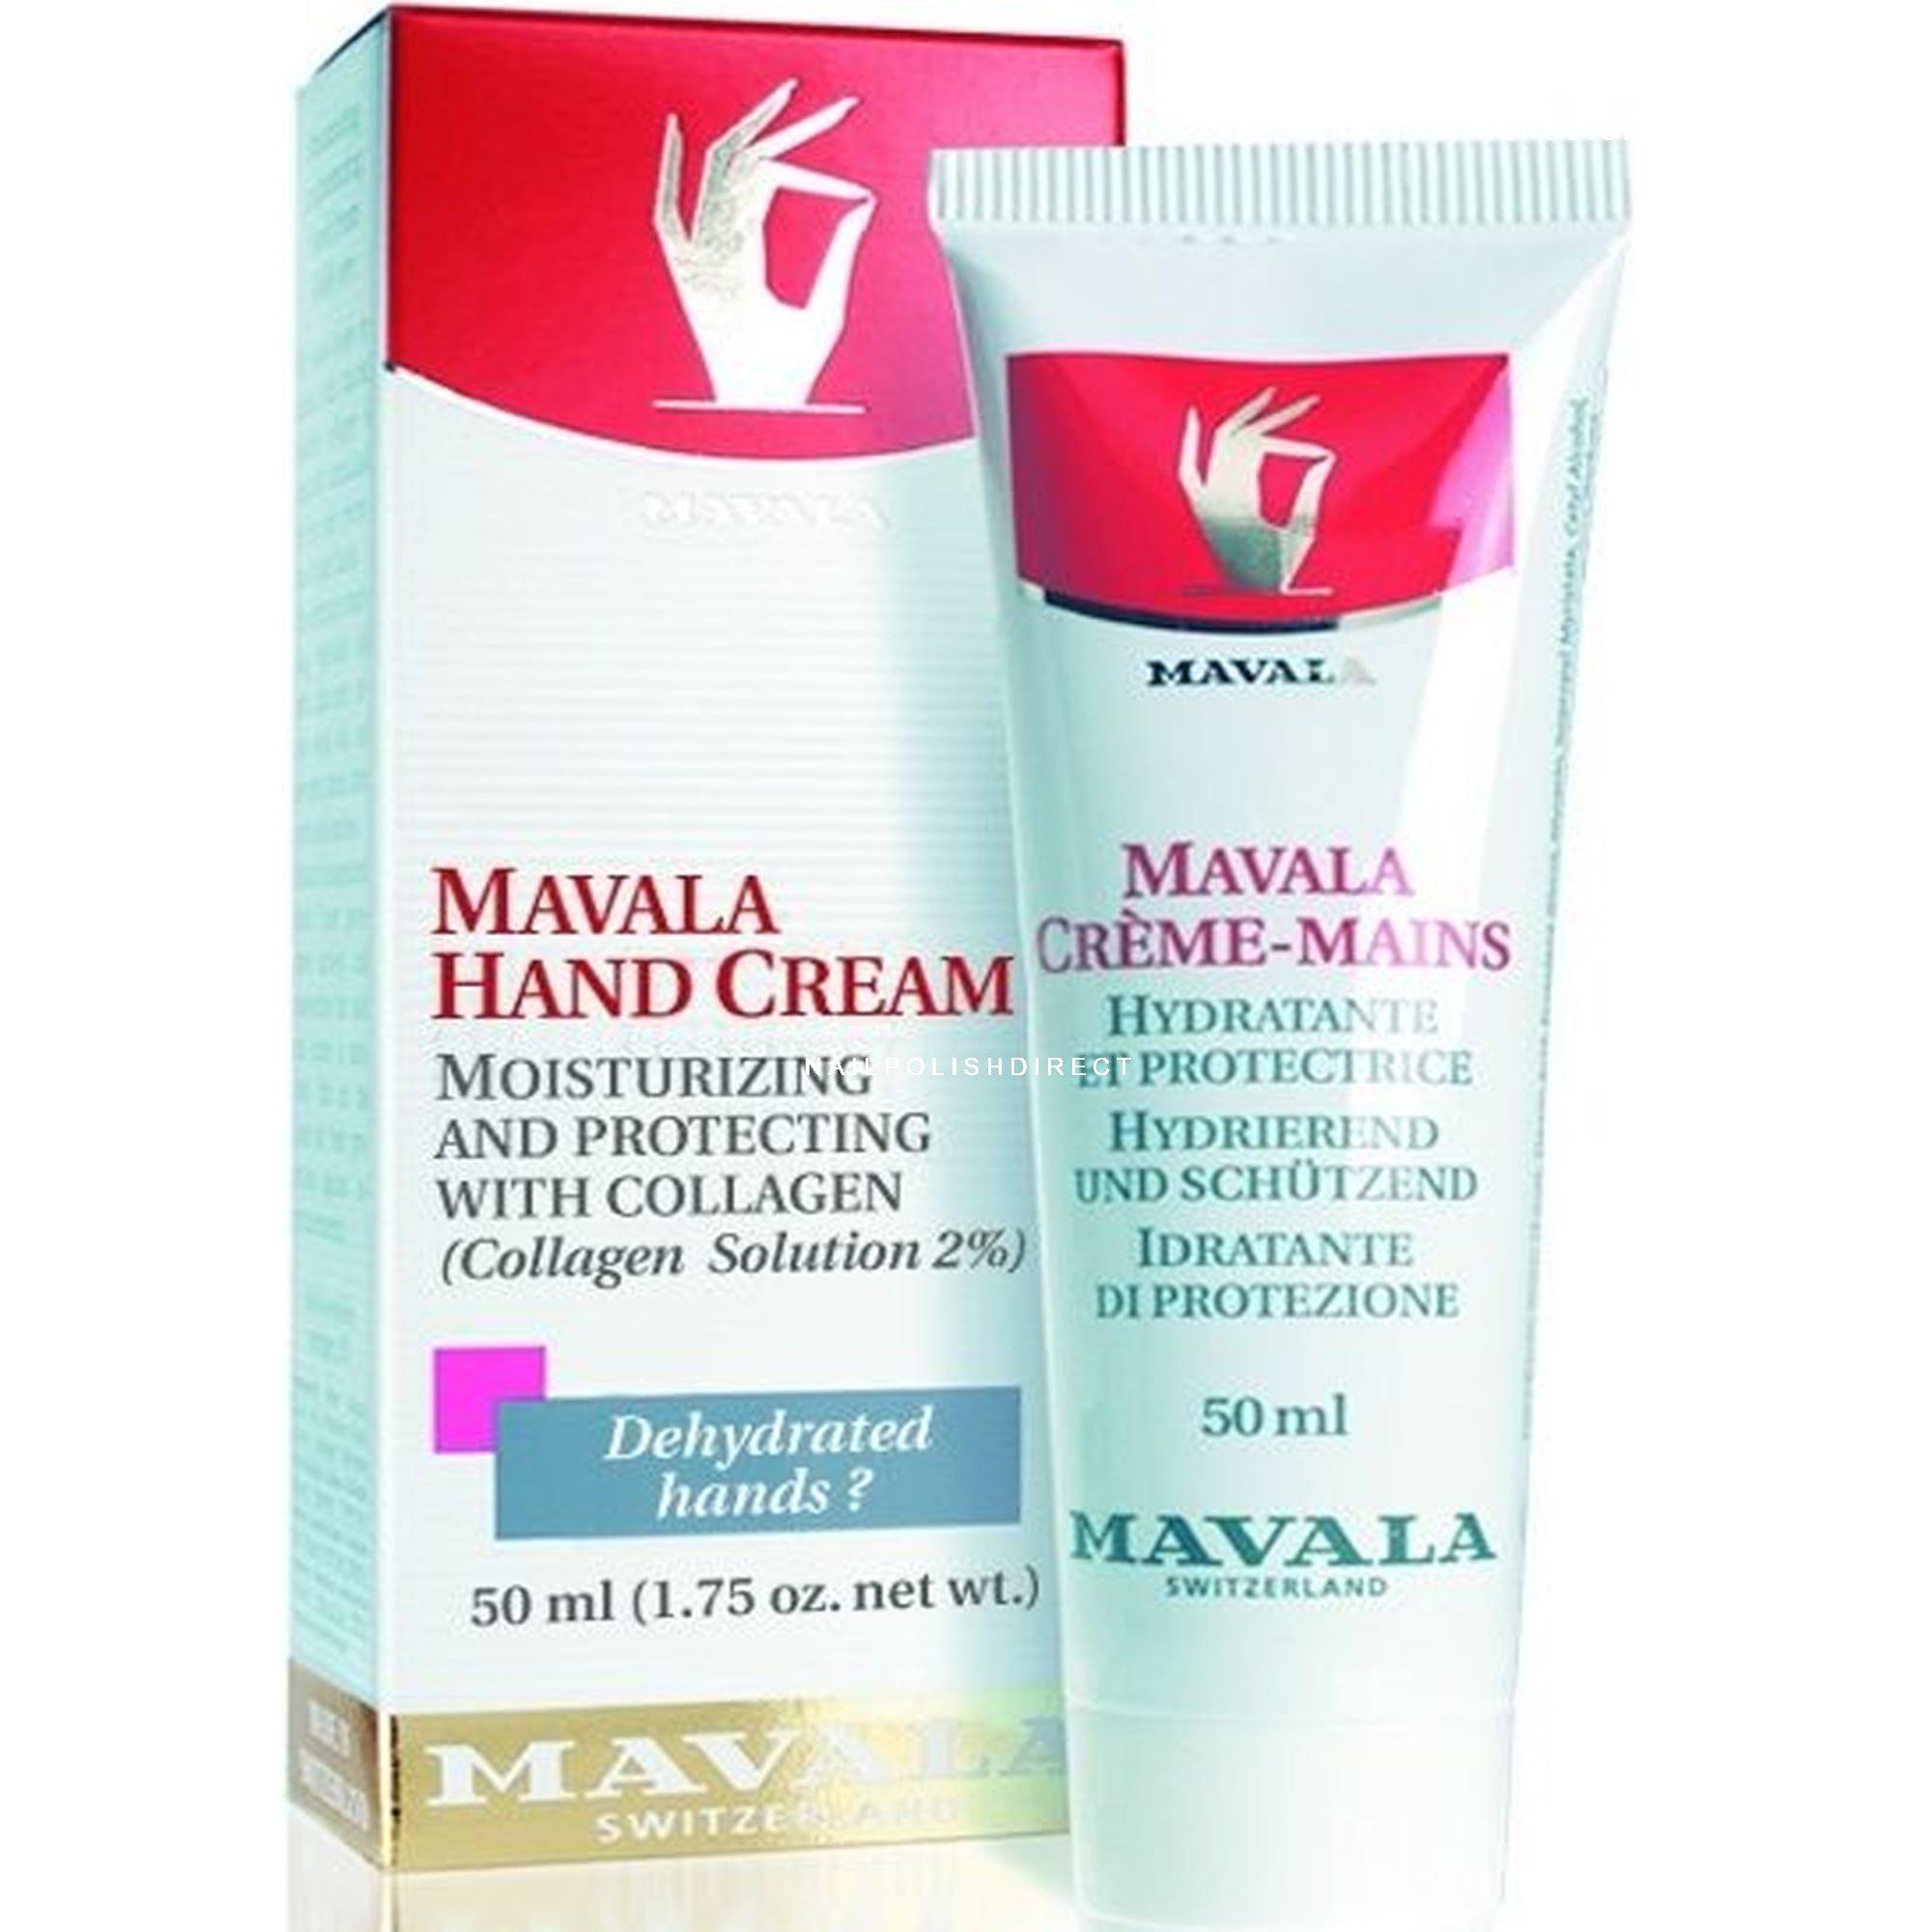 Mavala Hand Cream Moisturizing 50ml